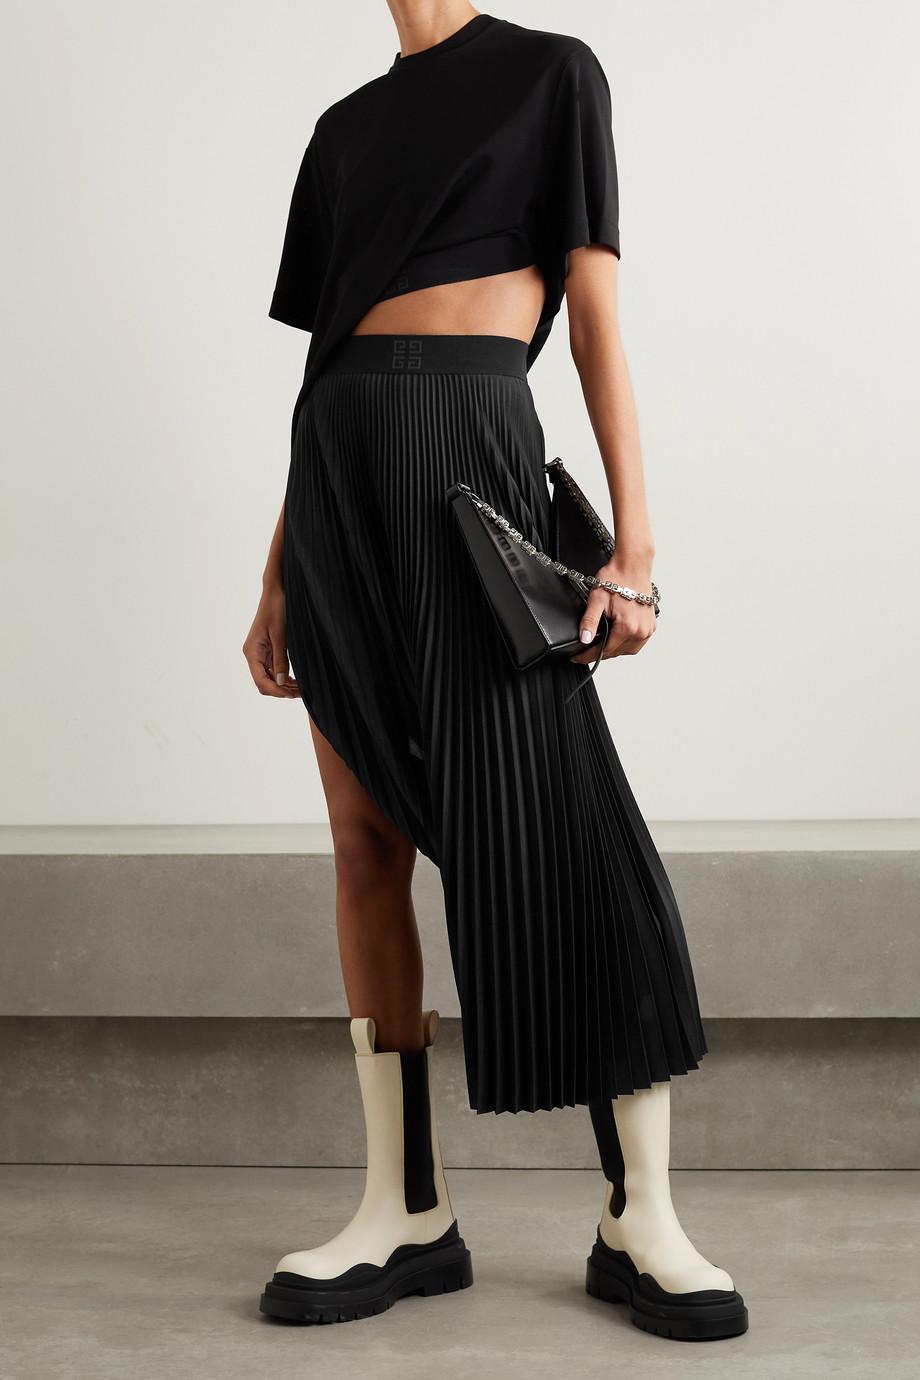 Givenchy Haut raccourci convertible en jersey stretch à finitions en gros-grain